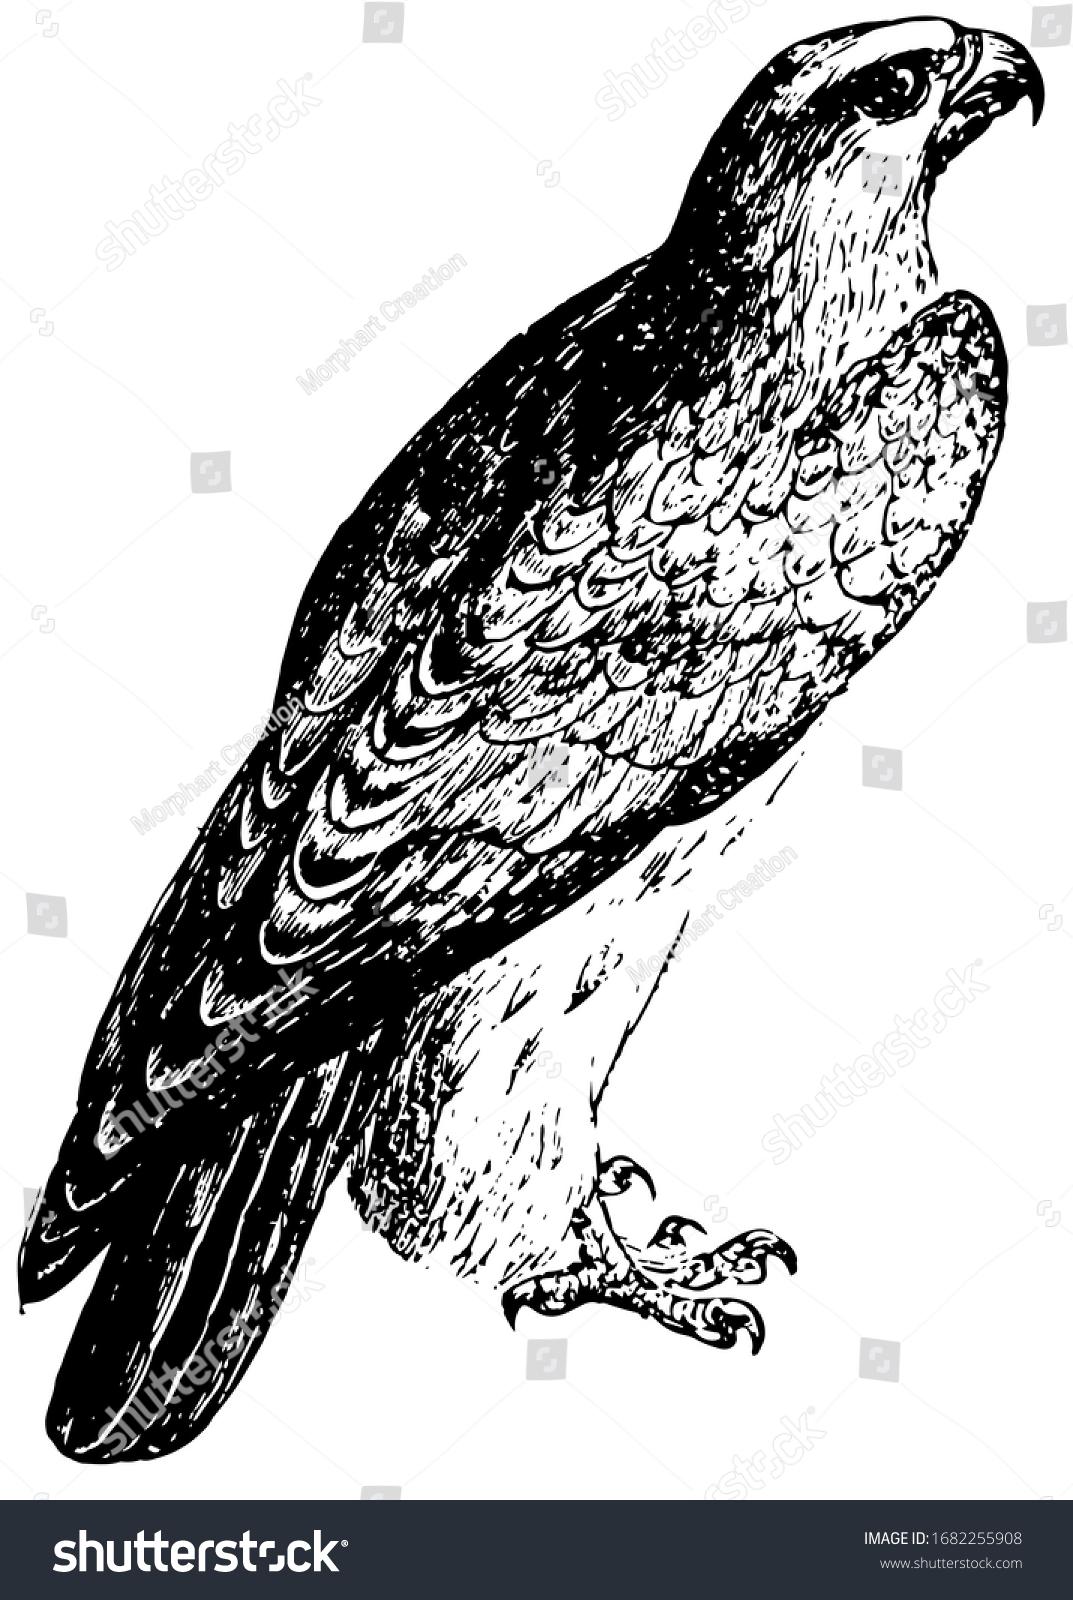 Falcon Group Birds Prey That Vary Stock Vector Royalty Free 1682255908